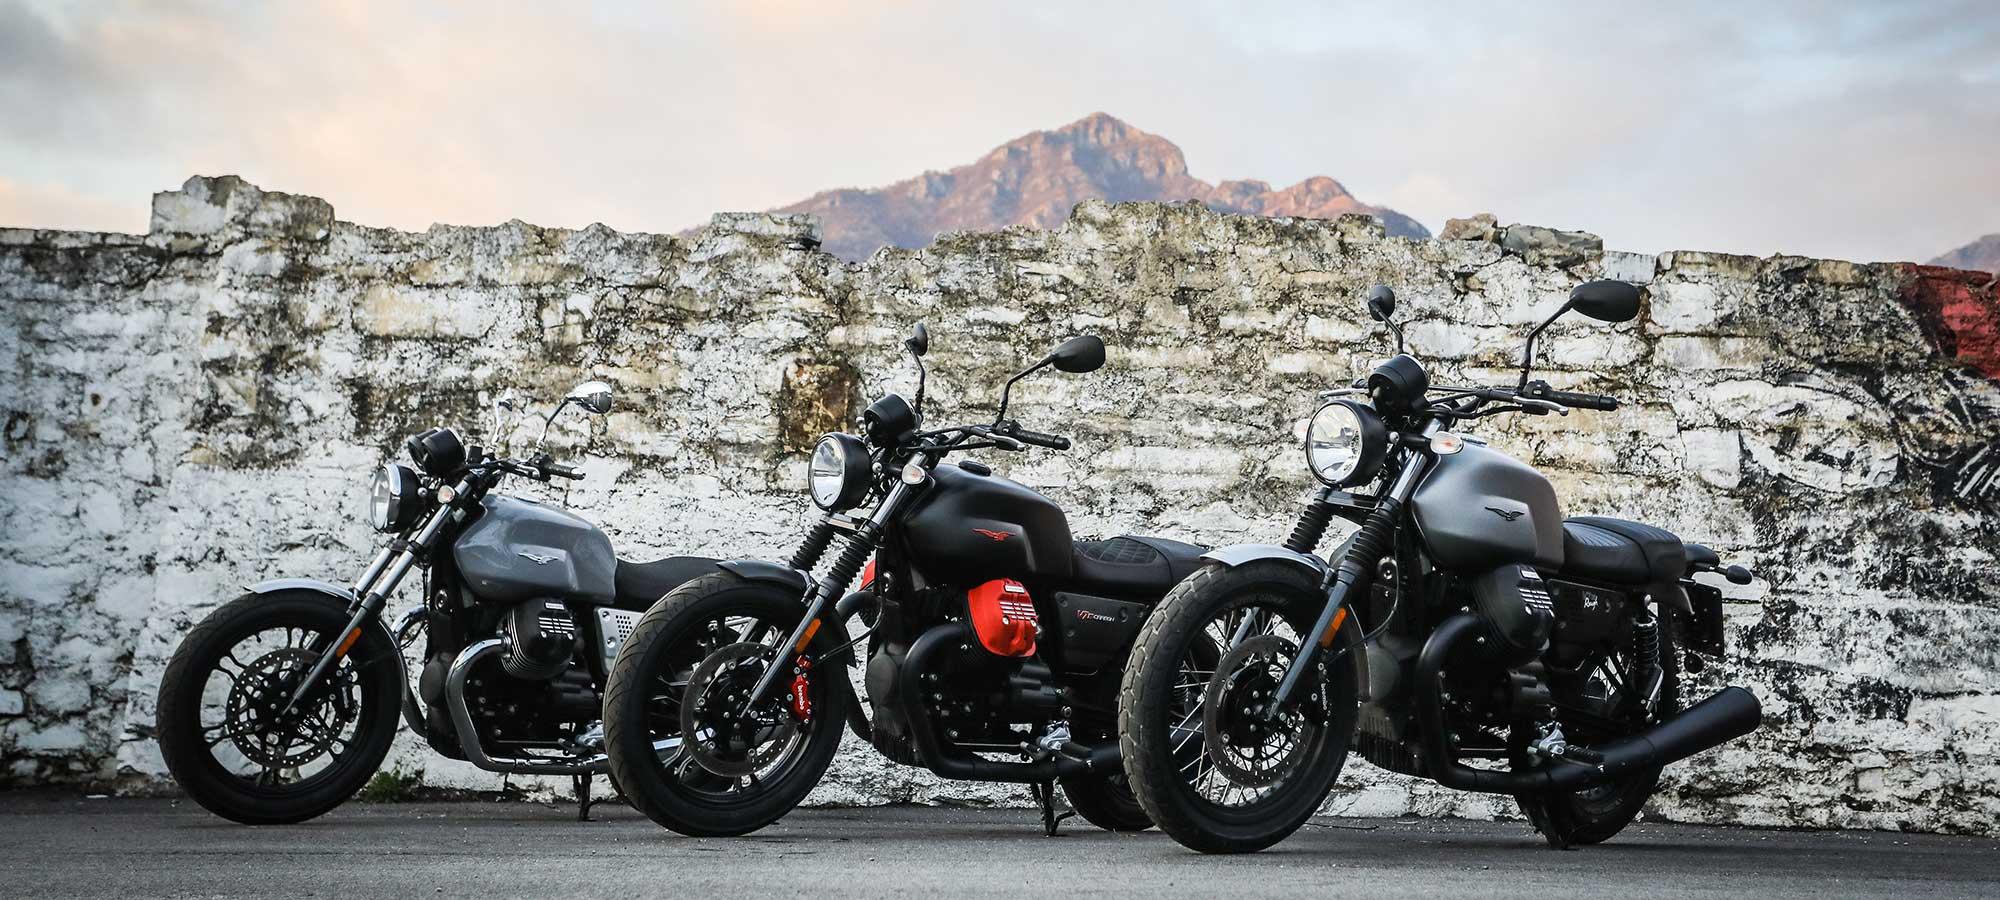 2018 Moto Guzzi V7 IIIs And MGX-21